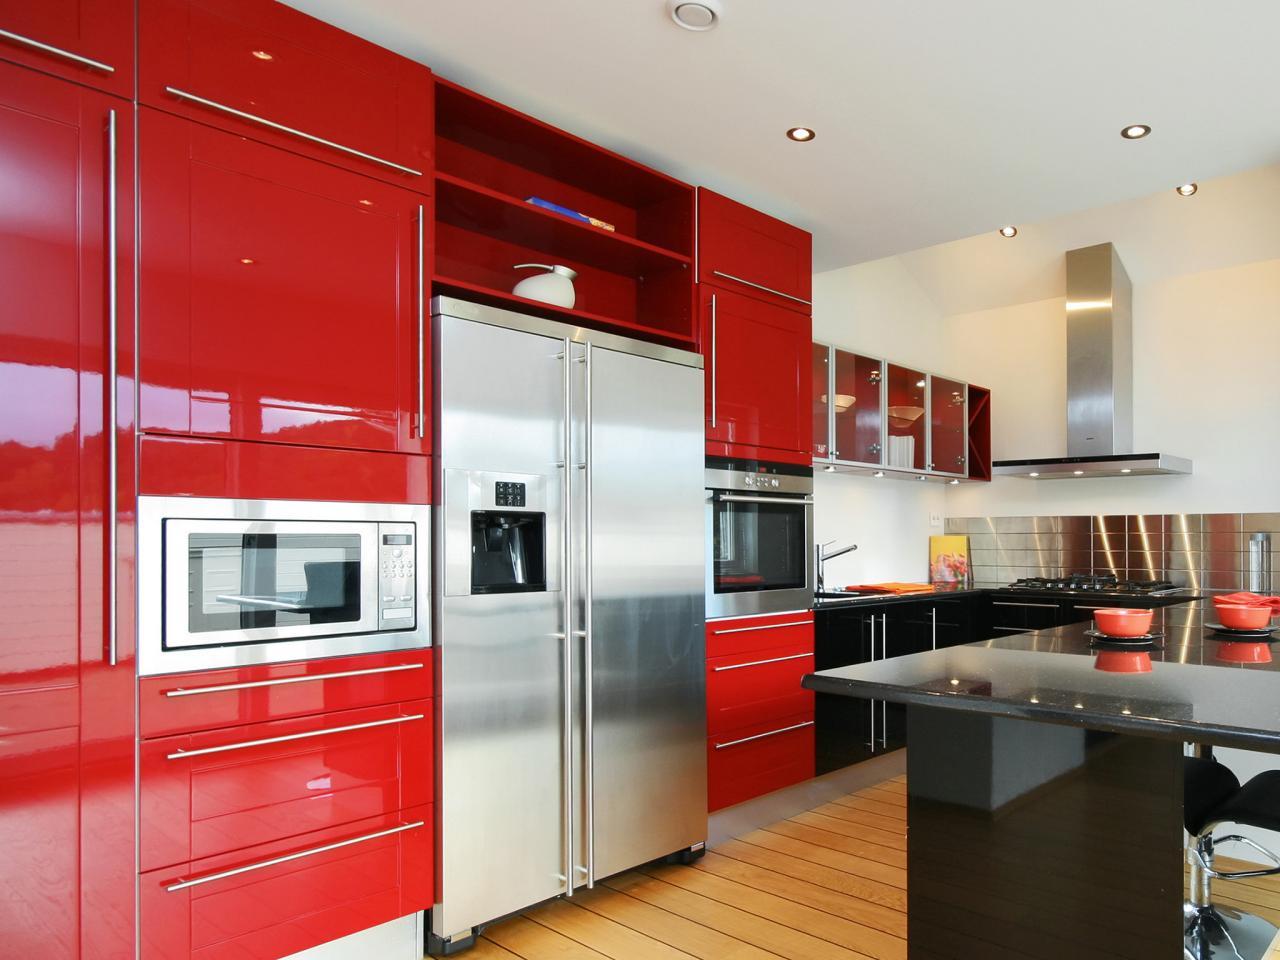 big-metal-refigerator-in-red-kitchen-armoires-face-black-countertop-on-wood-floor